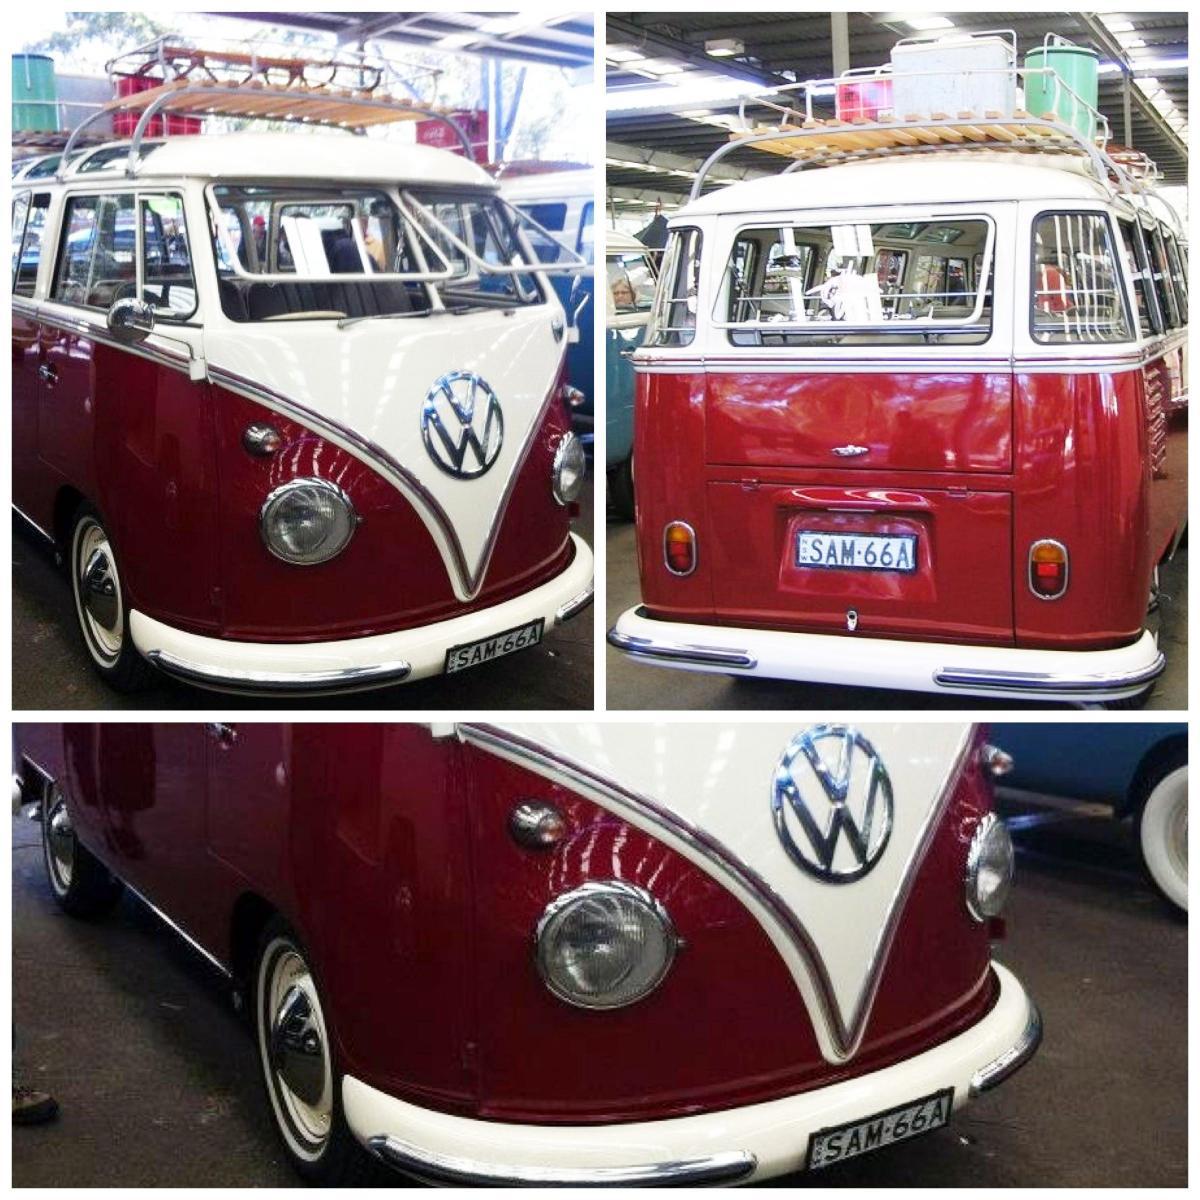 Righteous Kombis Blog   Righteous Kombis   Volkswagen Beetle and Kombi for Sale!